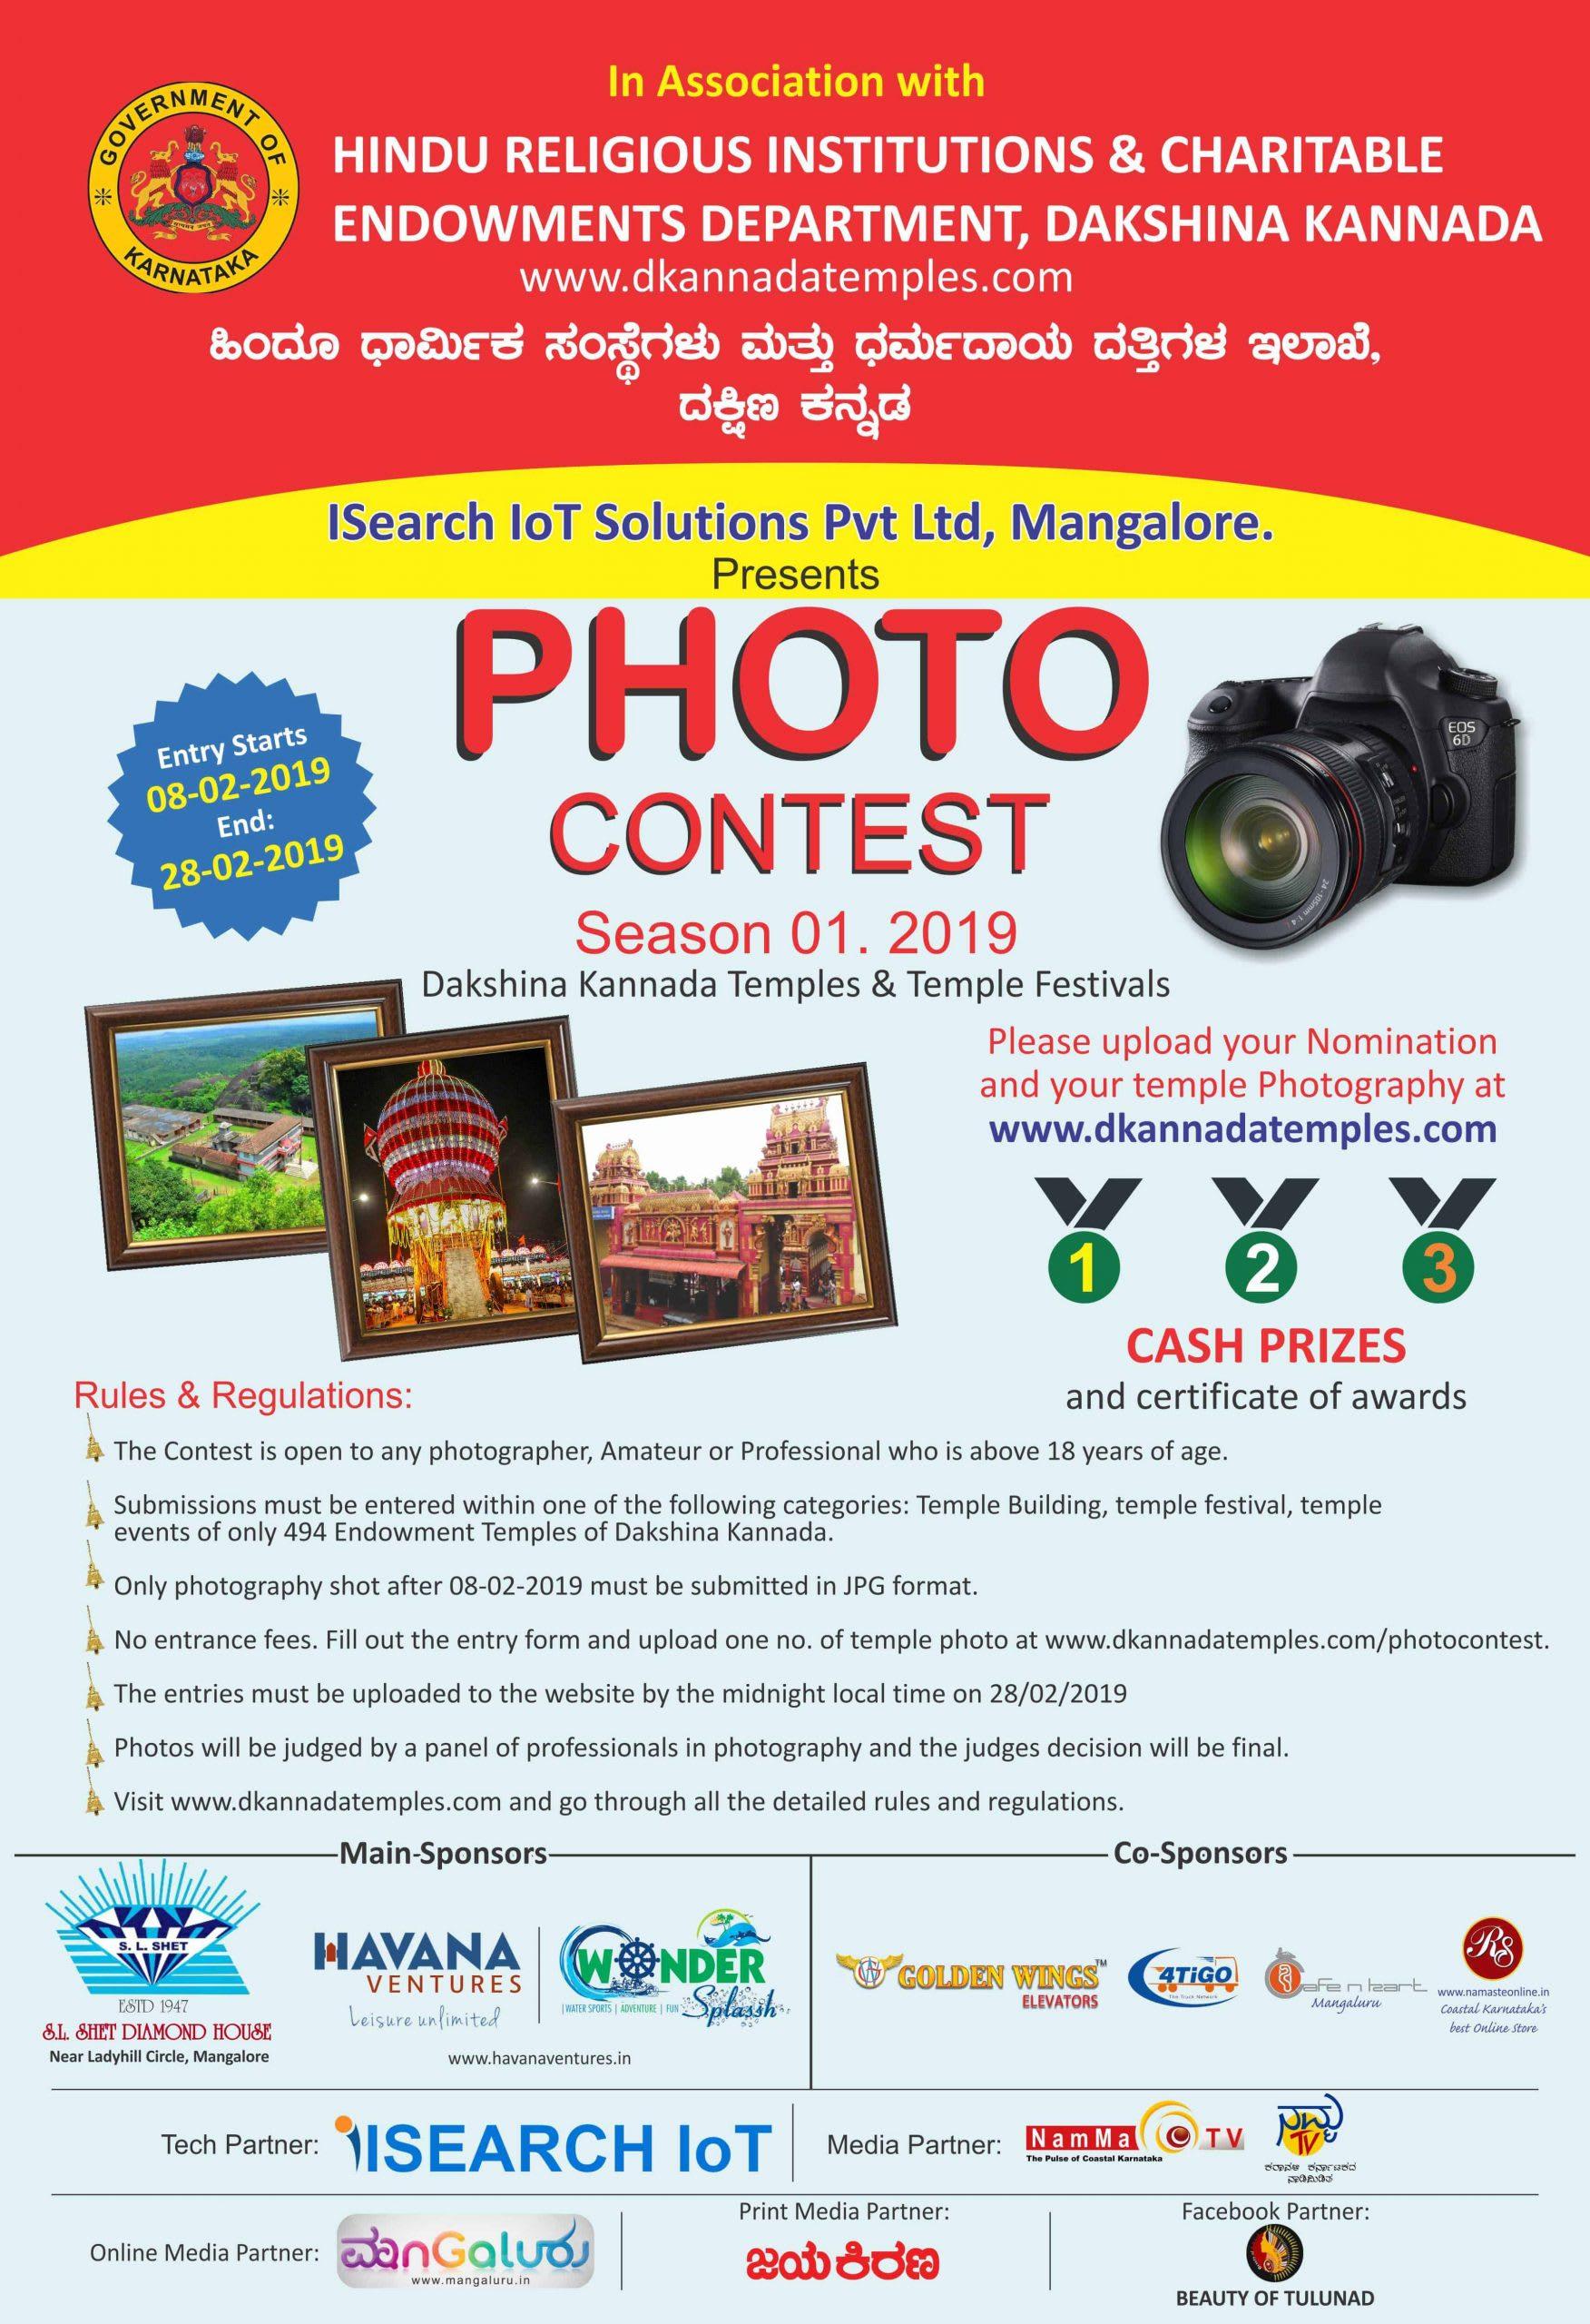 Hindu-Religious-Instituion-Charitable-endowment-Department-Dakshina-Kannada-photo-contest-2019-isearch-iot